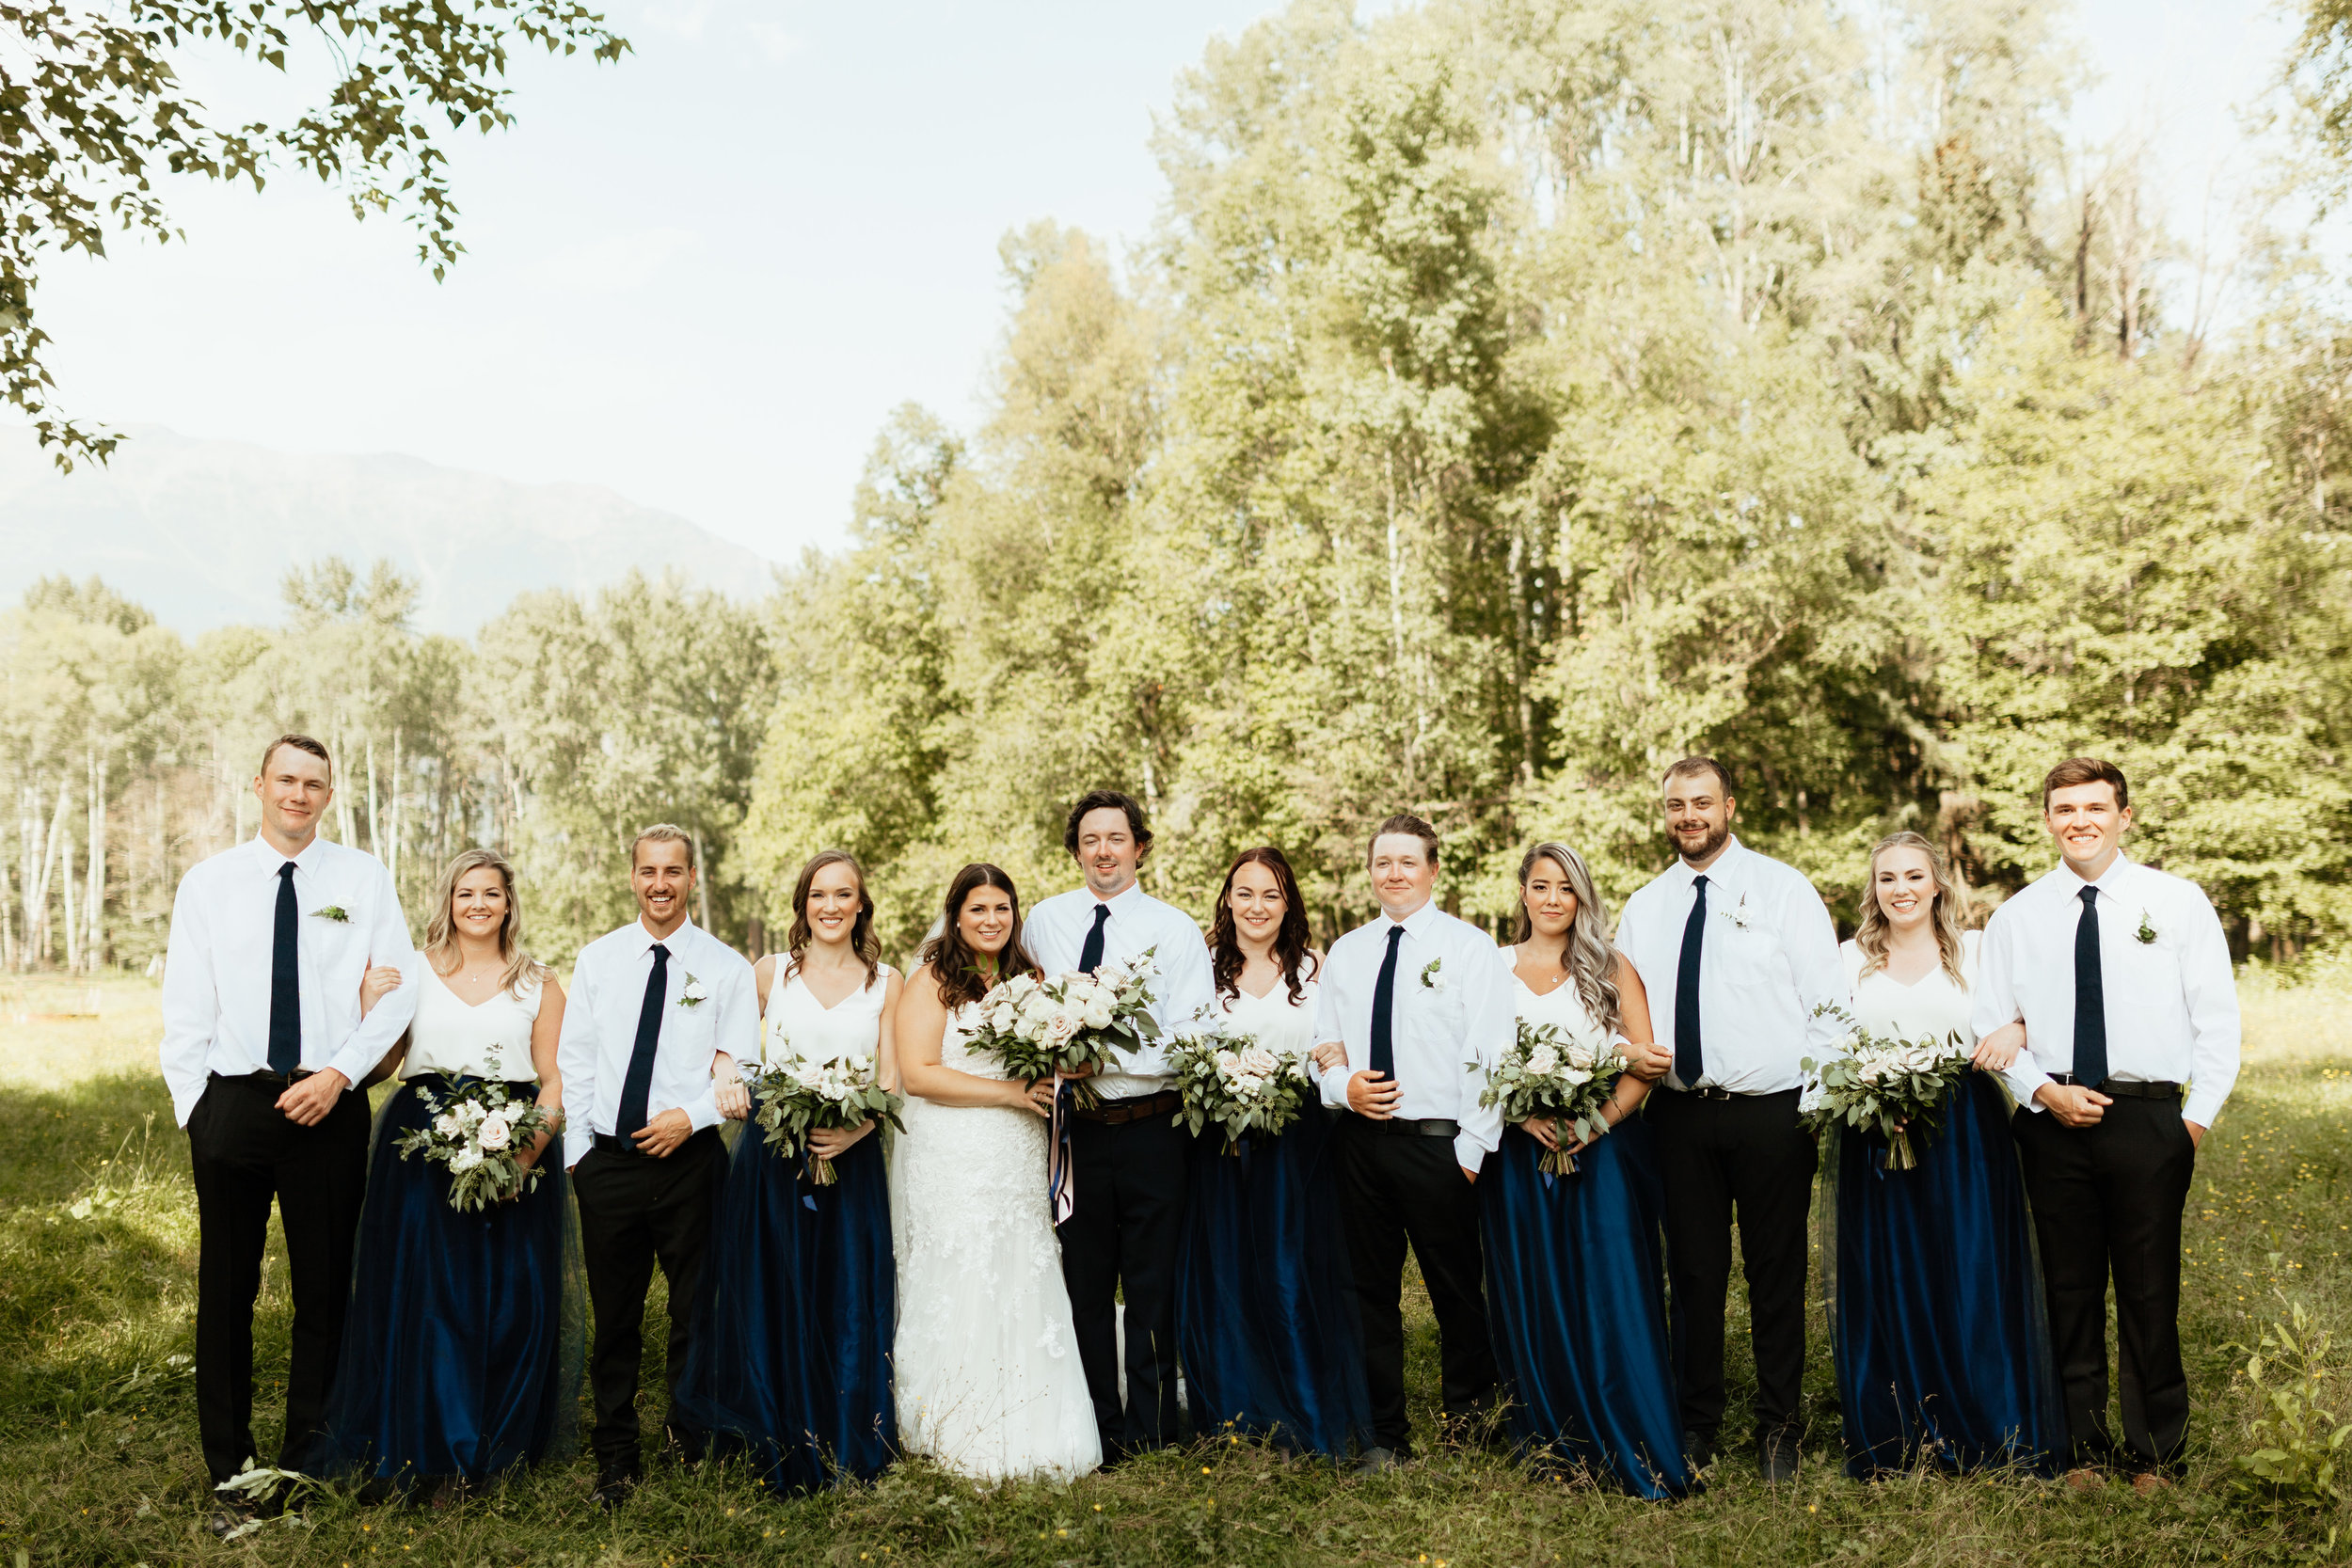 Trevor + Krista 5 - Bridal Portraits-34.jpg